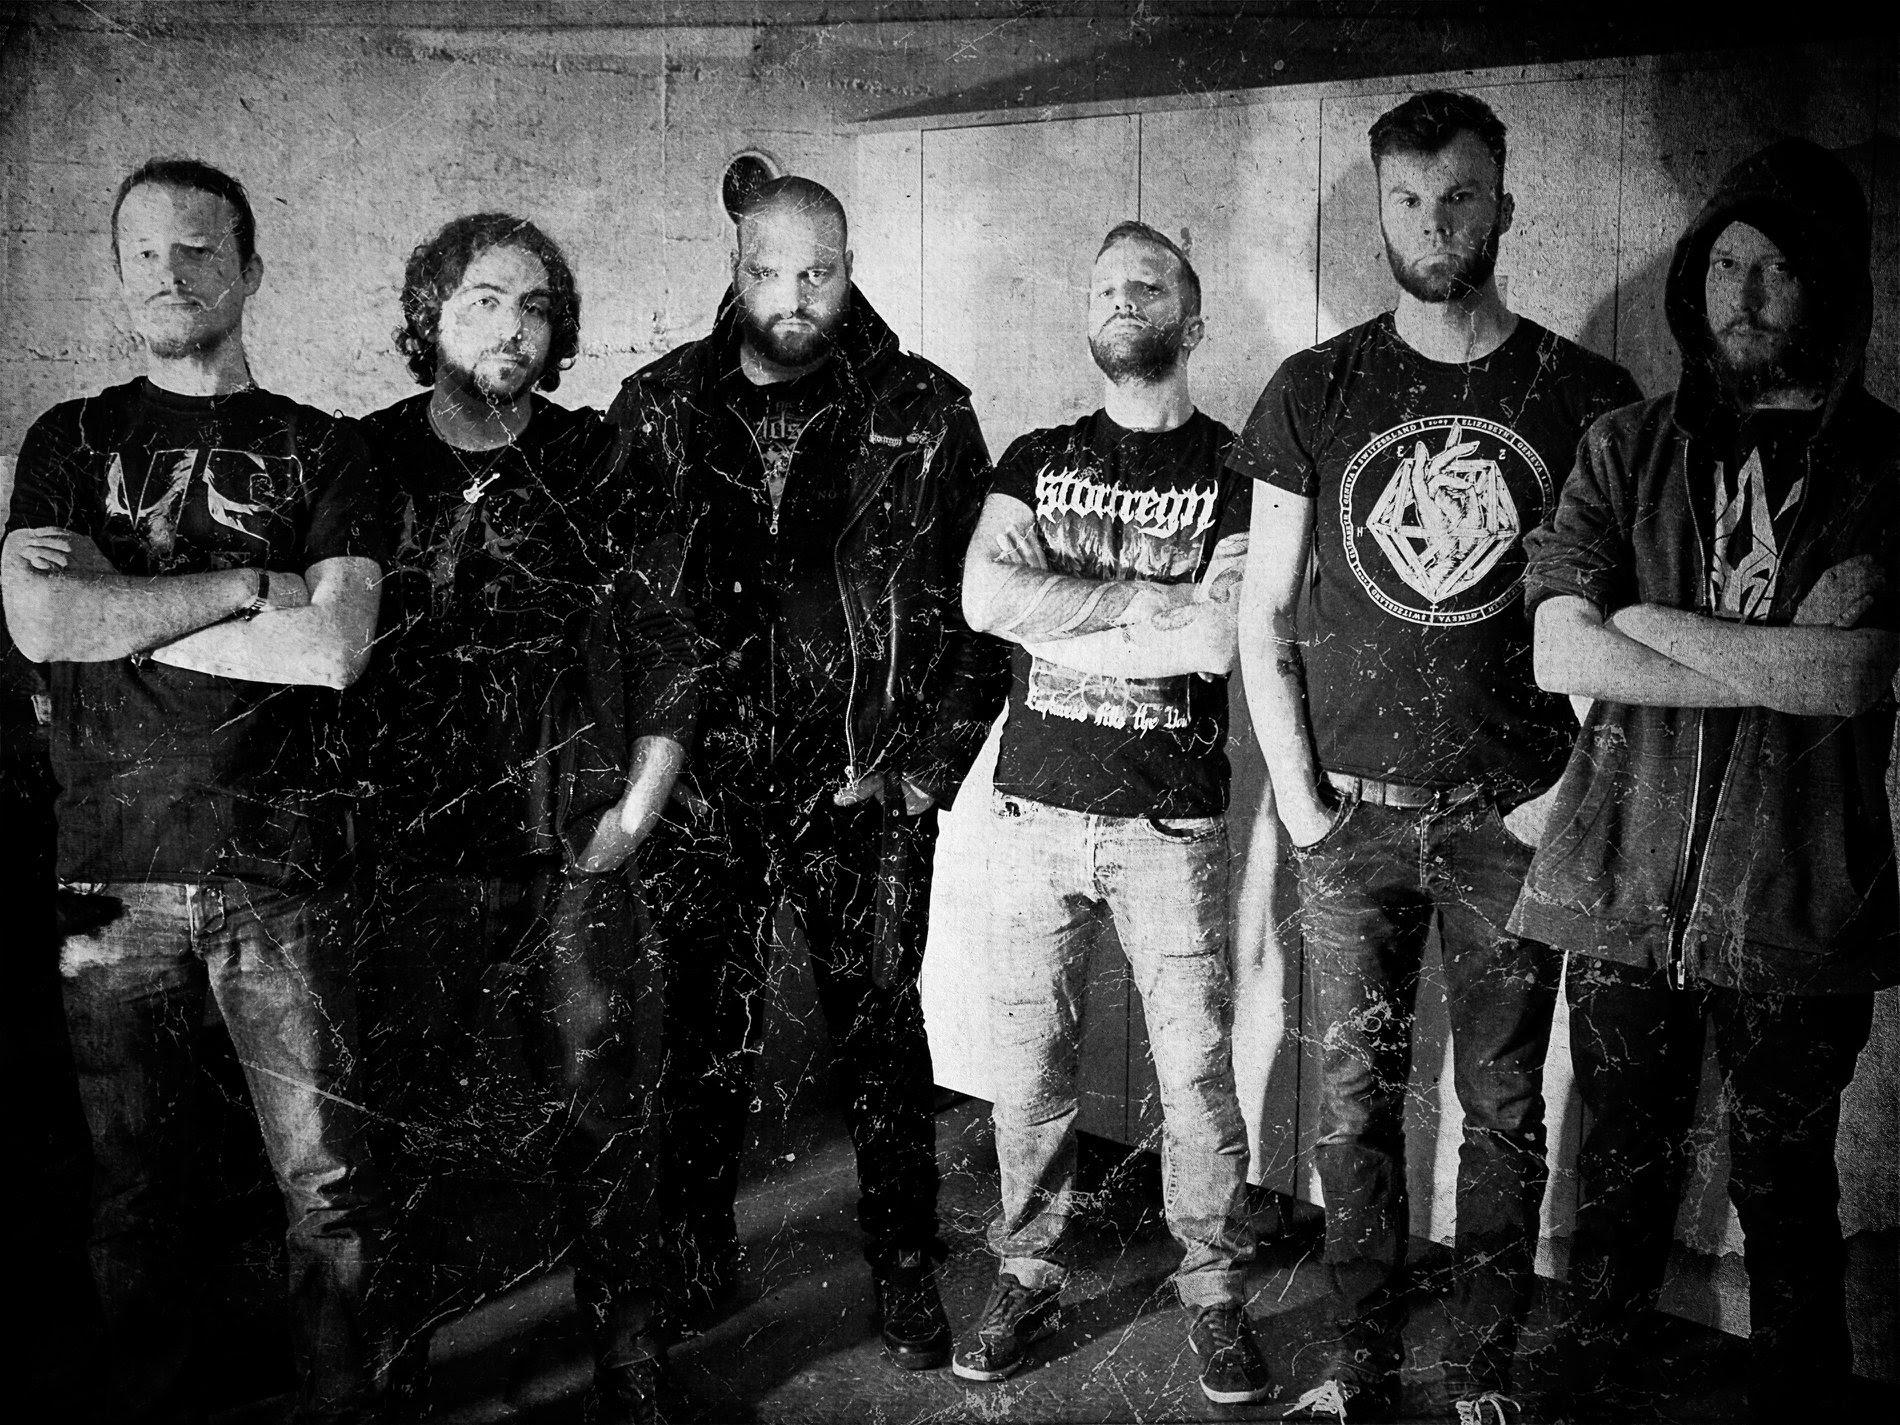 "VERSUS: Ανακοίνωσαν την κυκλοφορία του νεού τους άλμπουμ ""Endless Duality"" και μας παρουσιάζουν το νέο τους single ""The World Eater""."